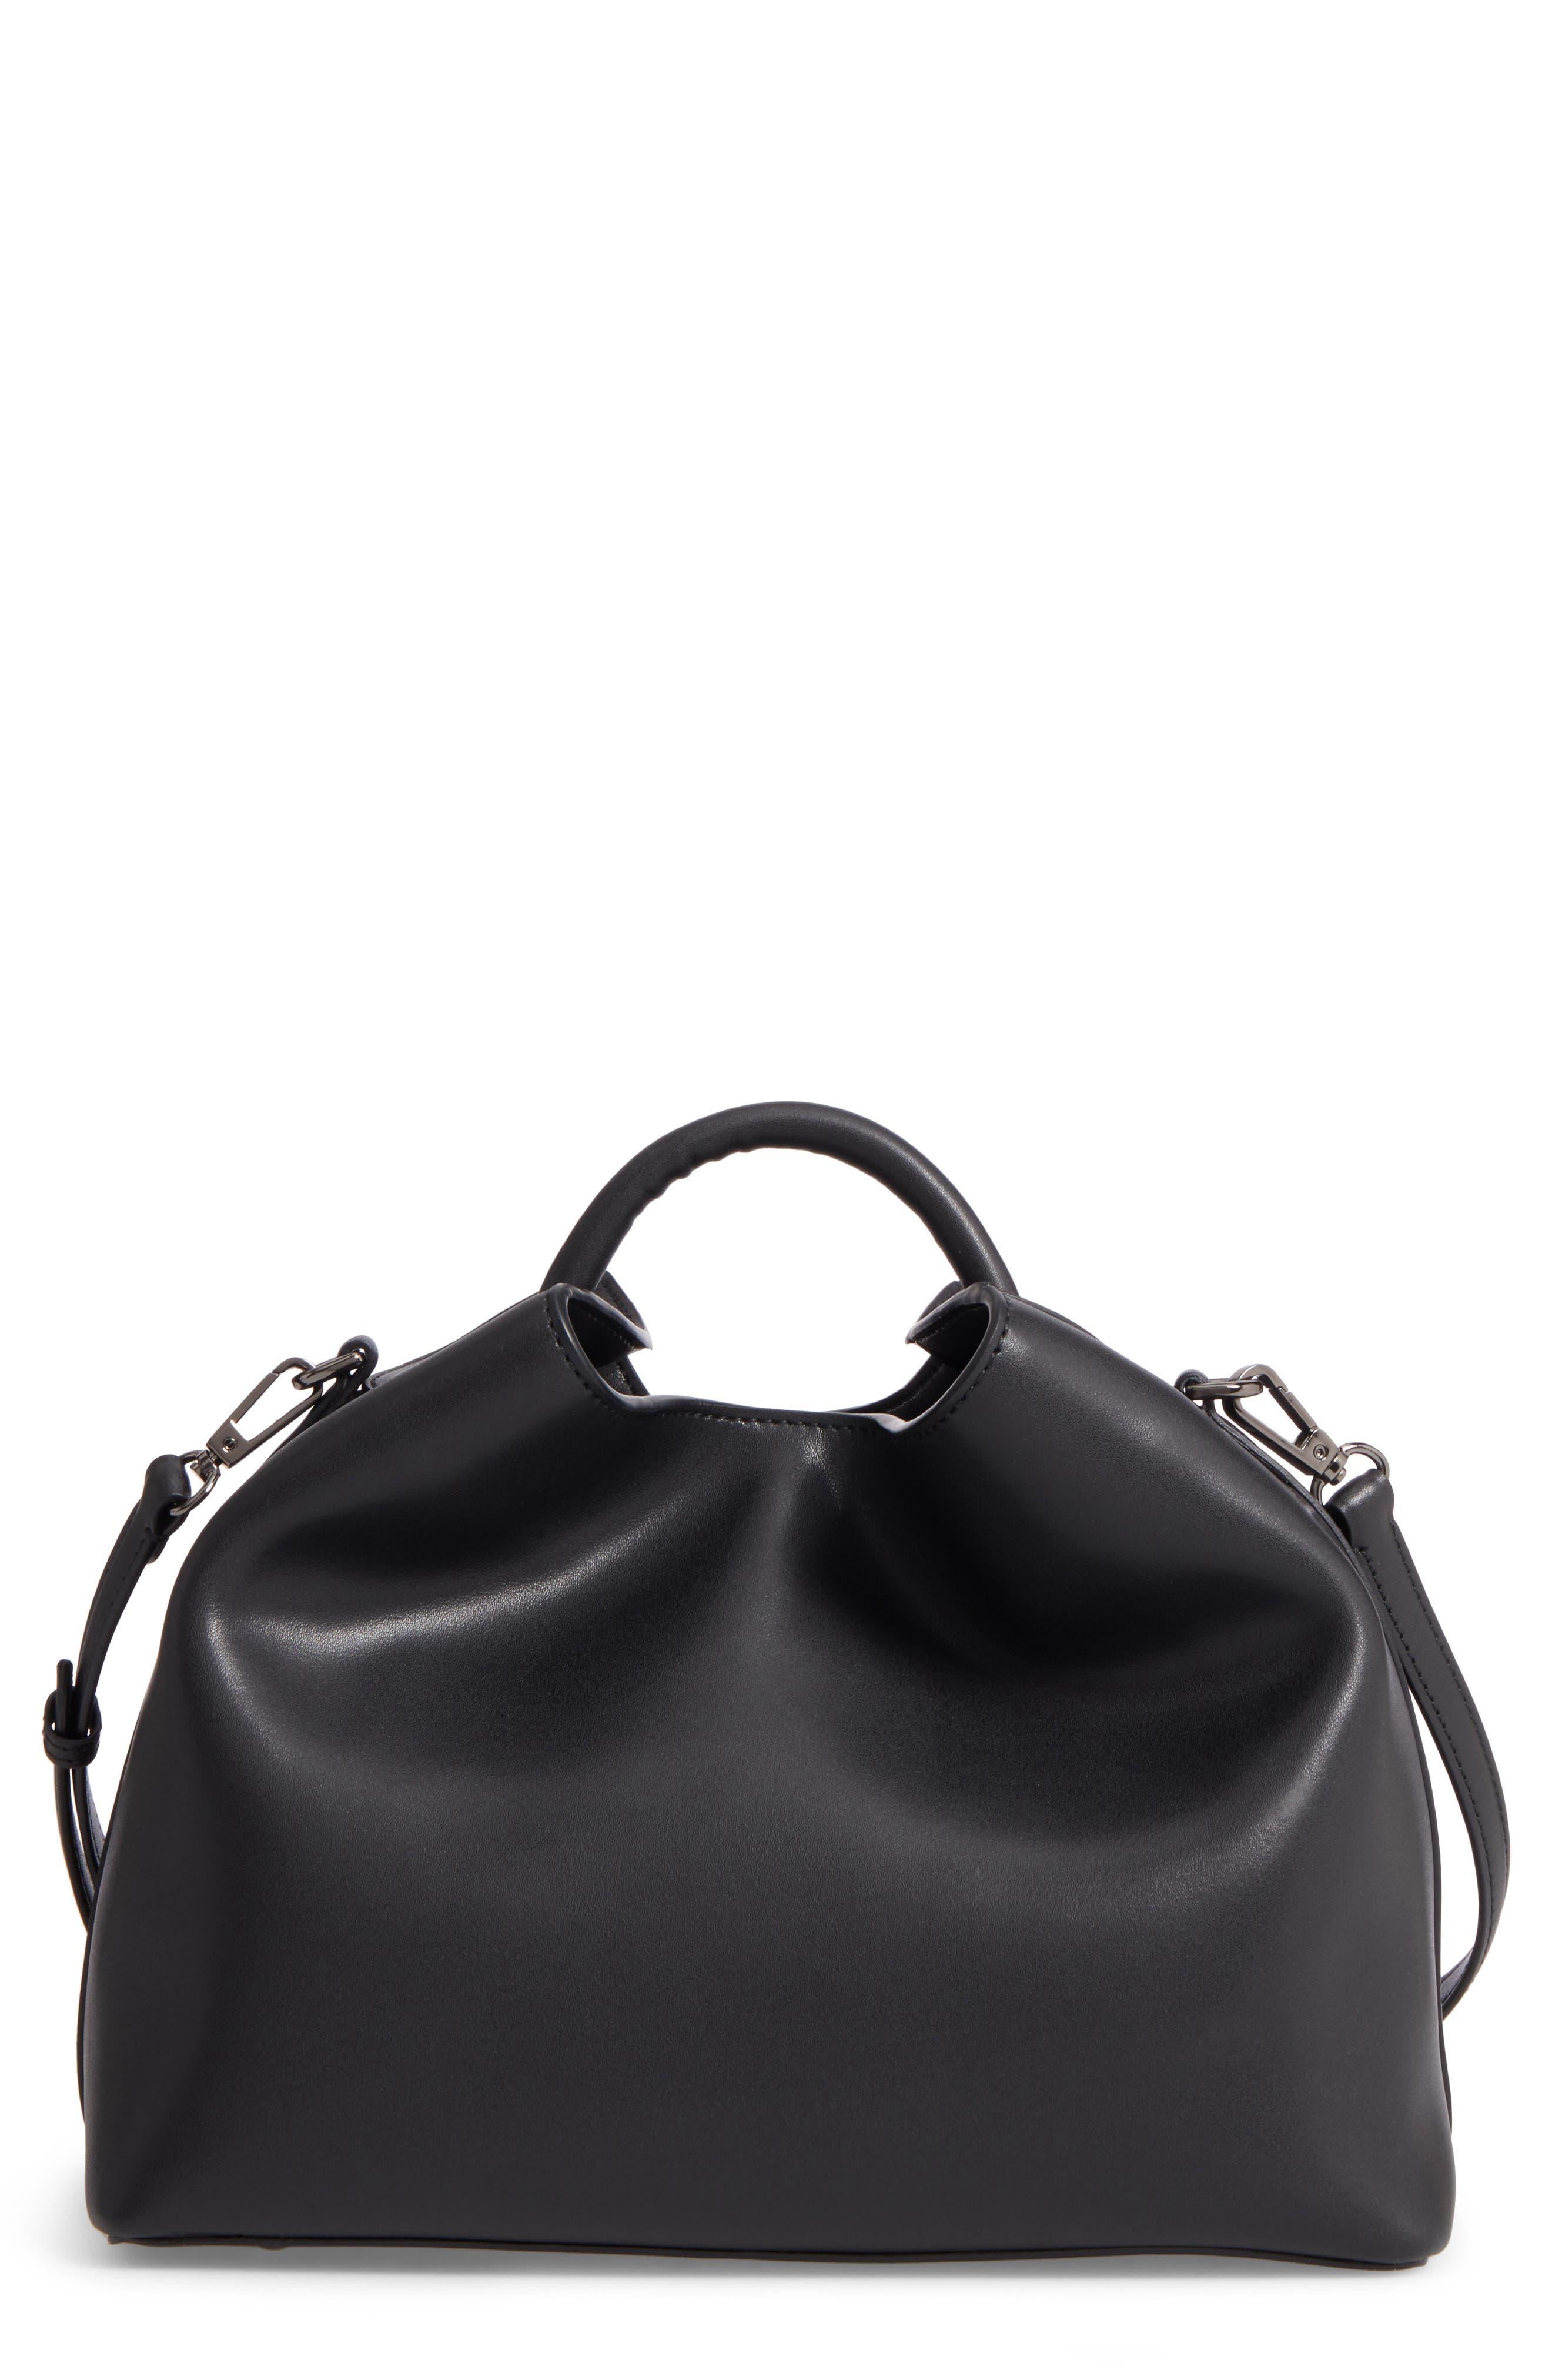 Raisin Leather Handbag,                         Main,                         color, 001